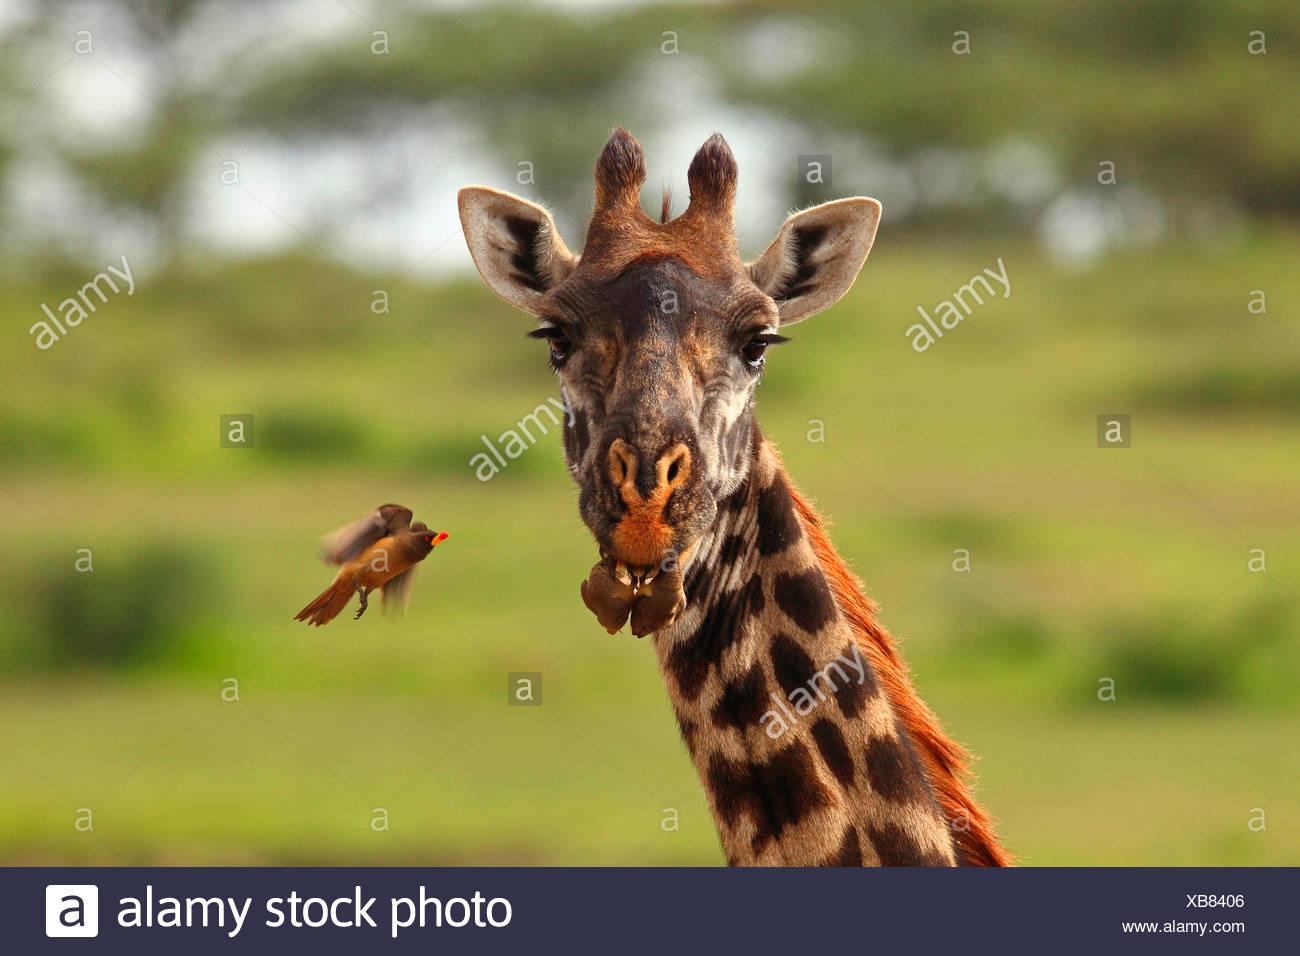 giraffe (Giraffa camelopardalis), red-billed oxpecker, Tanzania, Ngorongoro Conservation Area - Stock Image